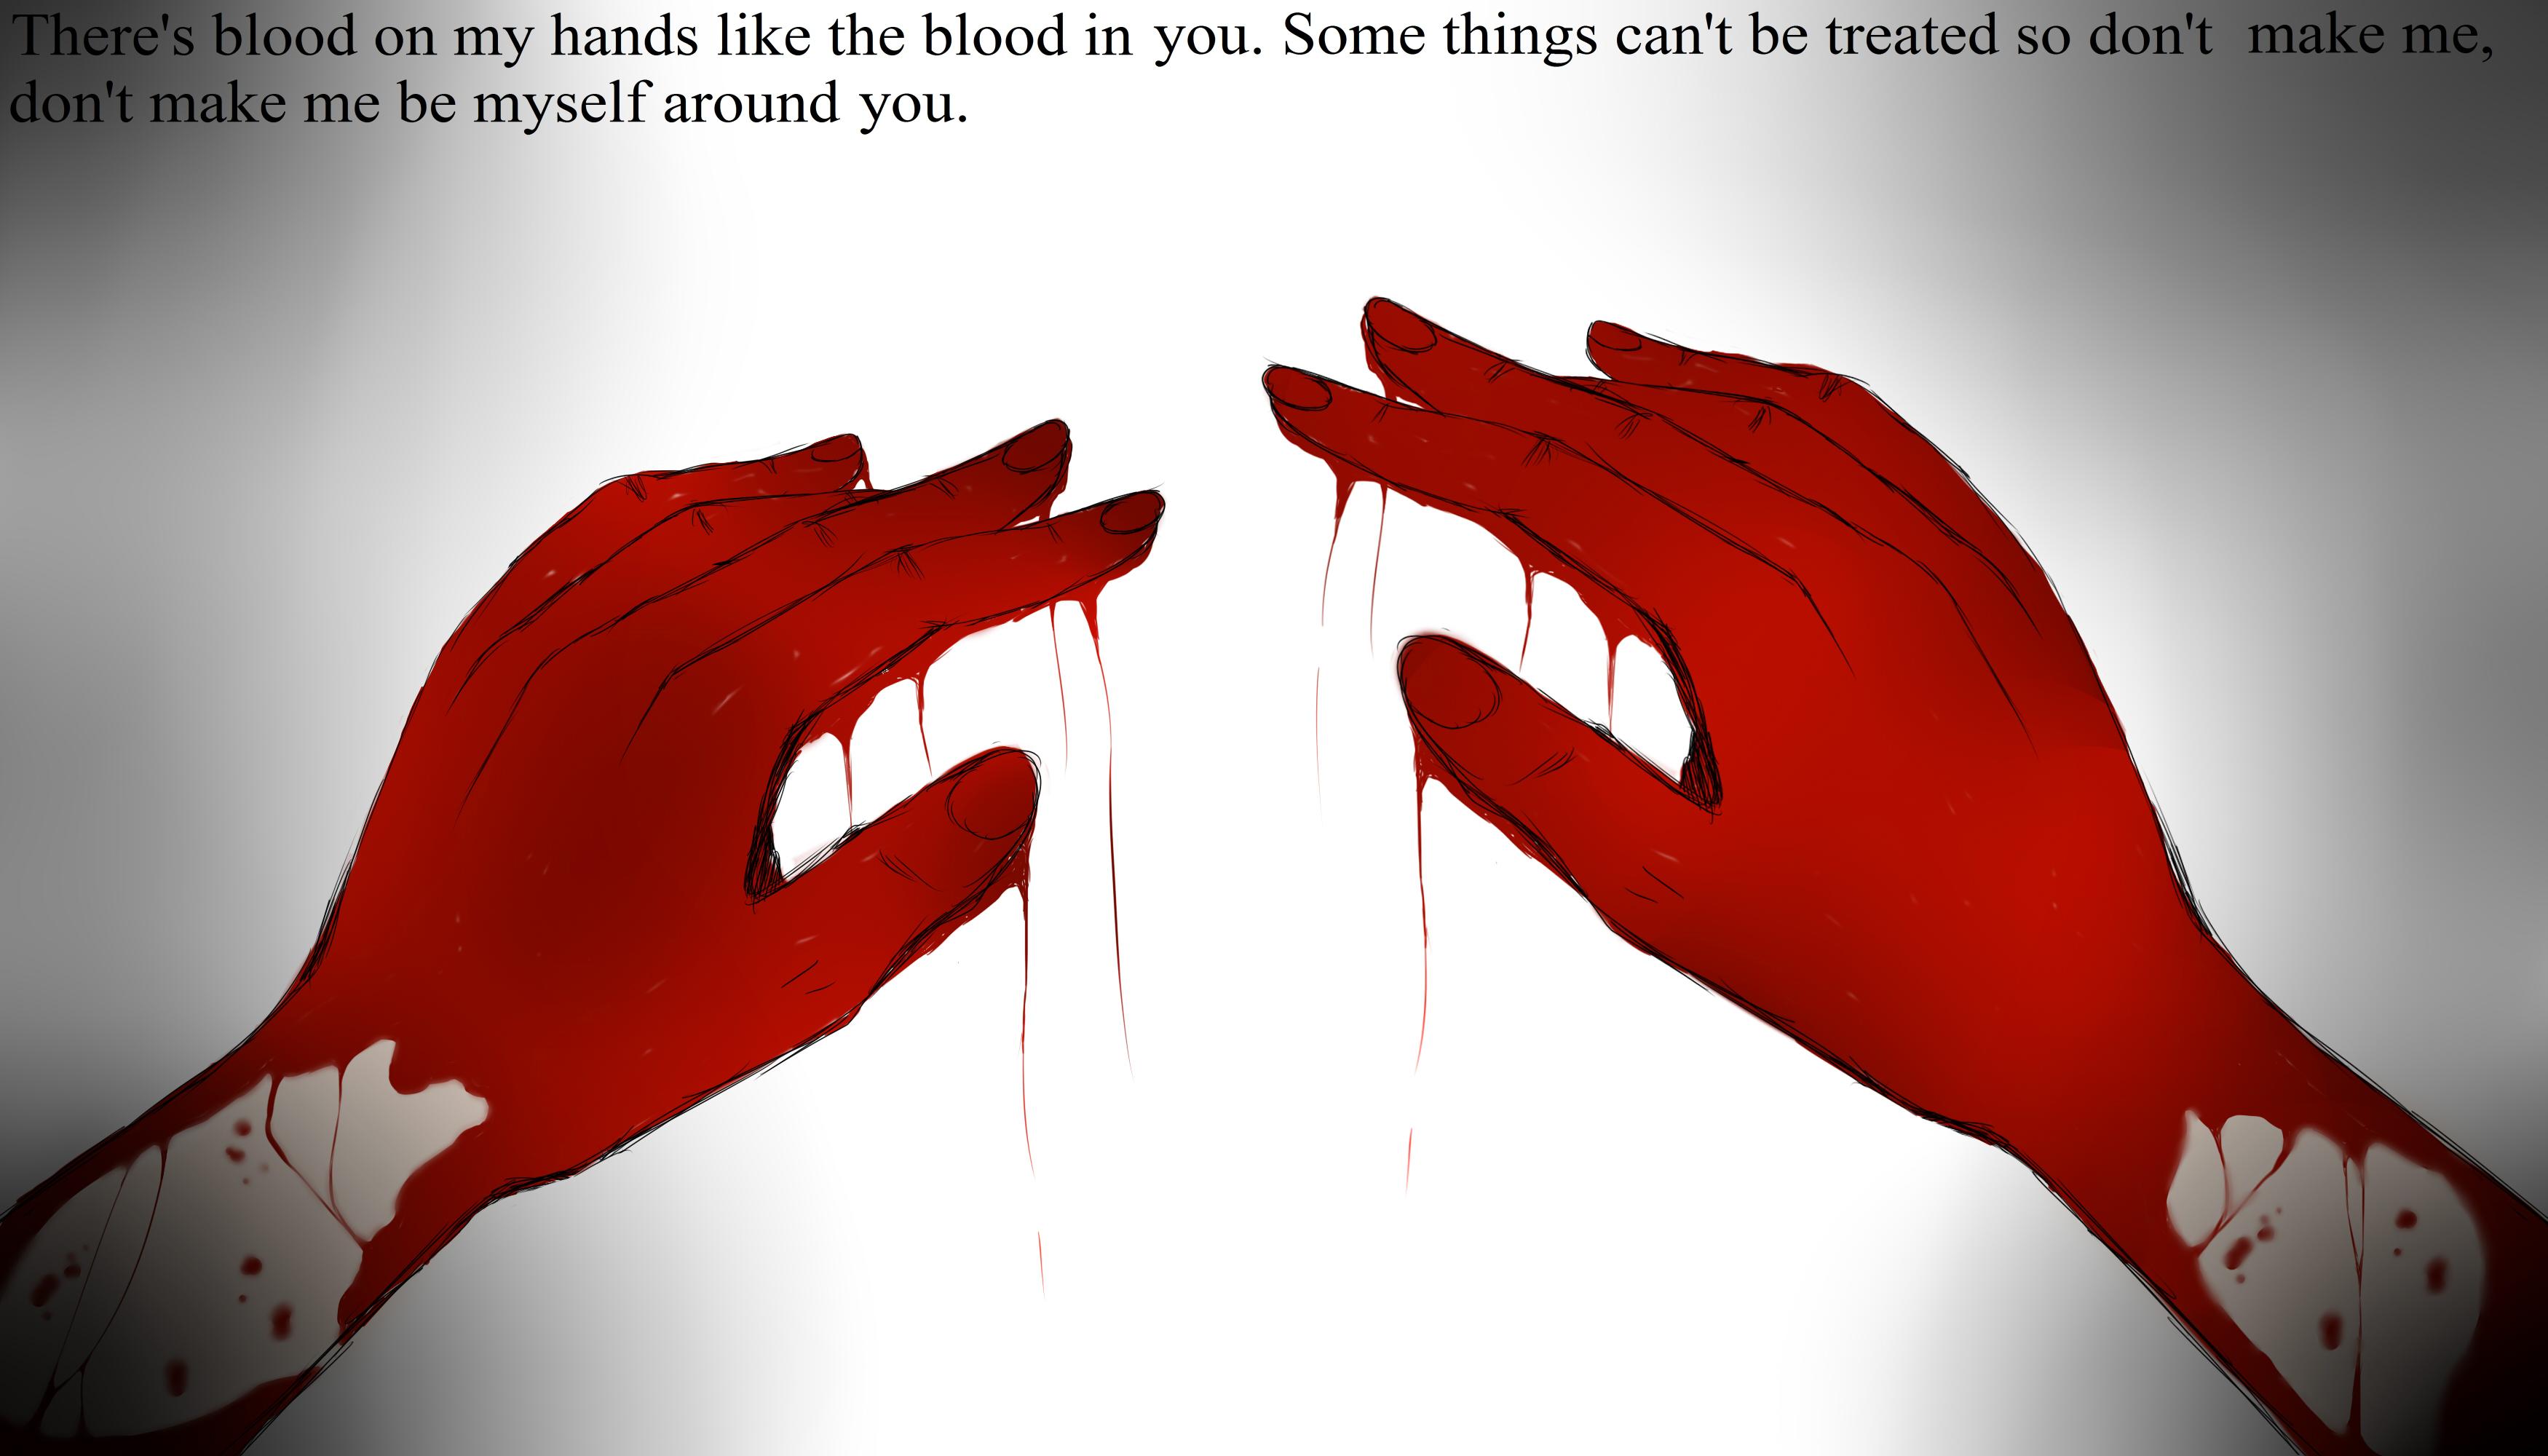 Blood on my hands by Zorocat on DeviantArt